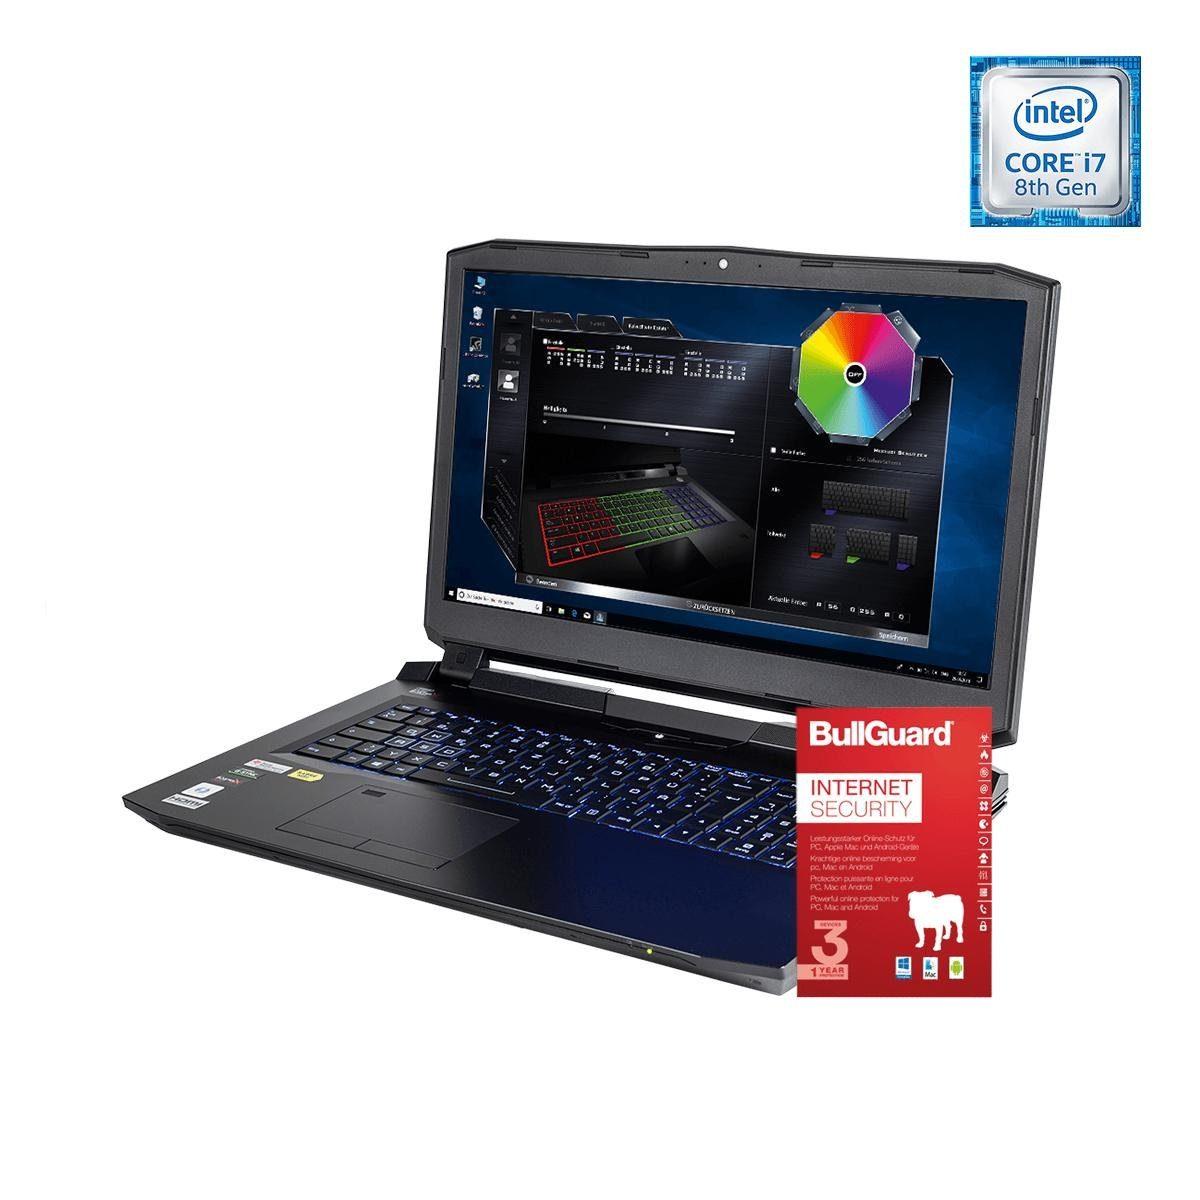 ONE GAMING Notebook, Core i7-8700K, GeForce GTX 1080, 8GB DDR4 RAM »NB 44915«